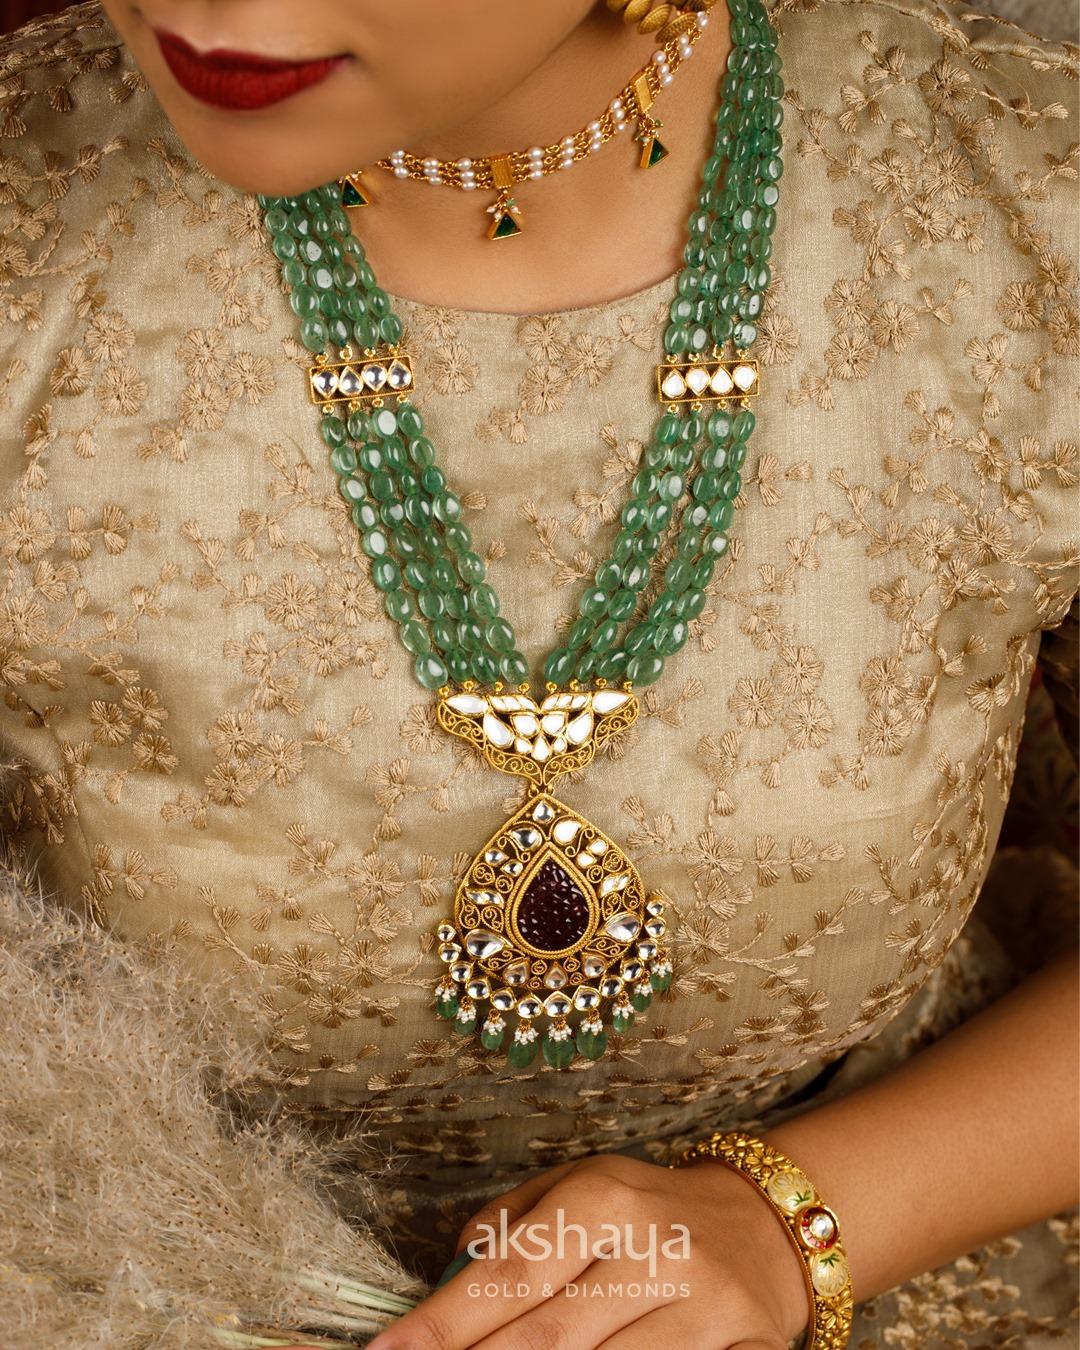 Akshaya Gold Necklace GL10249